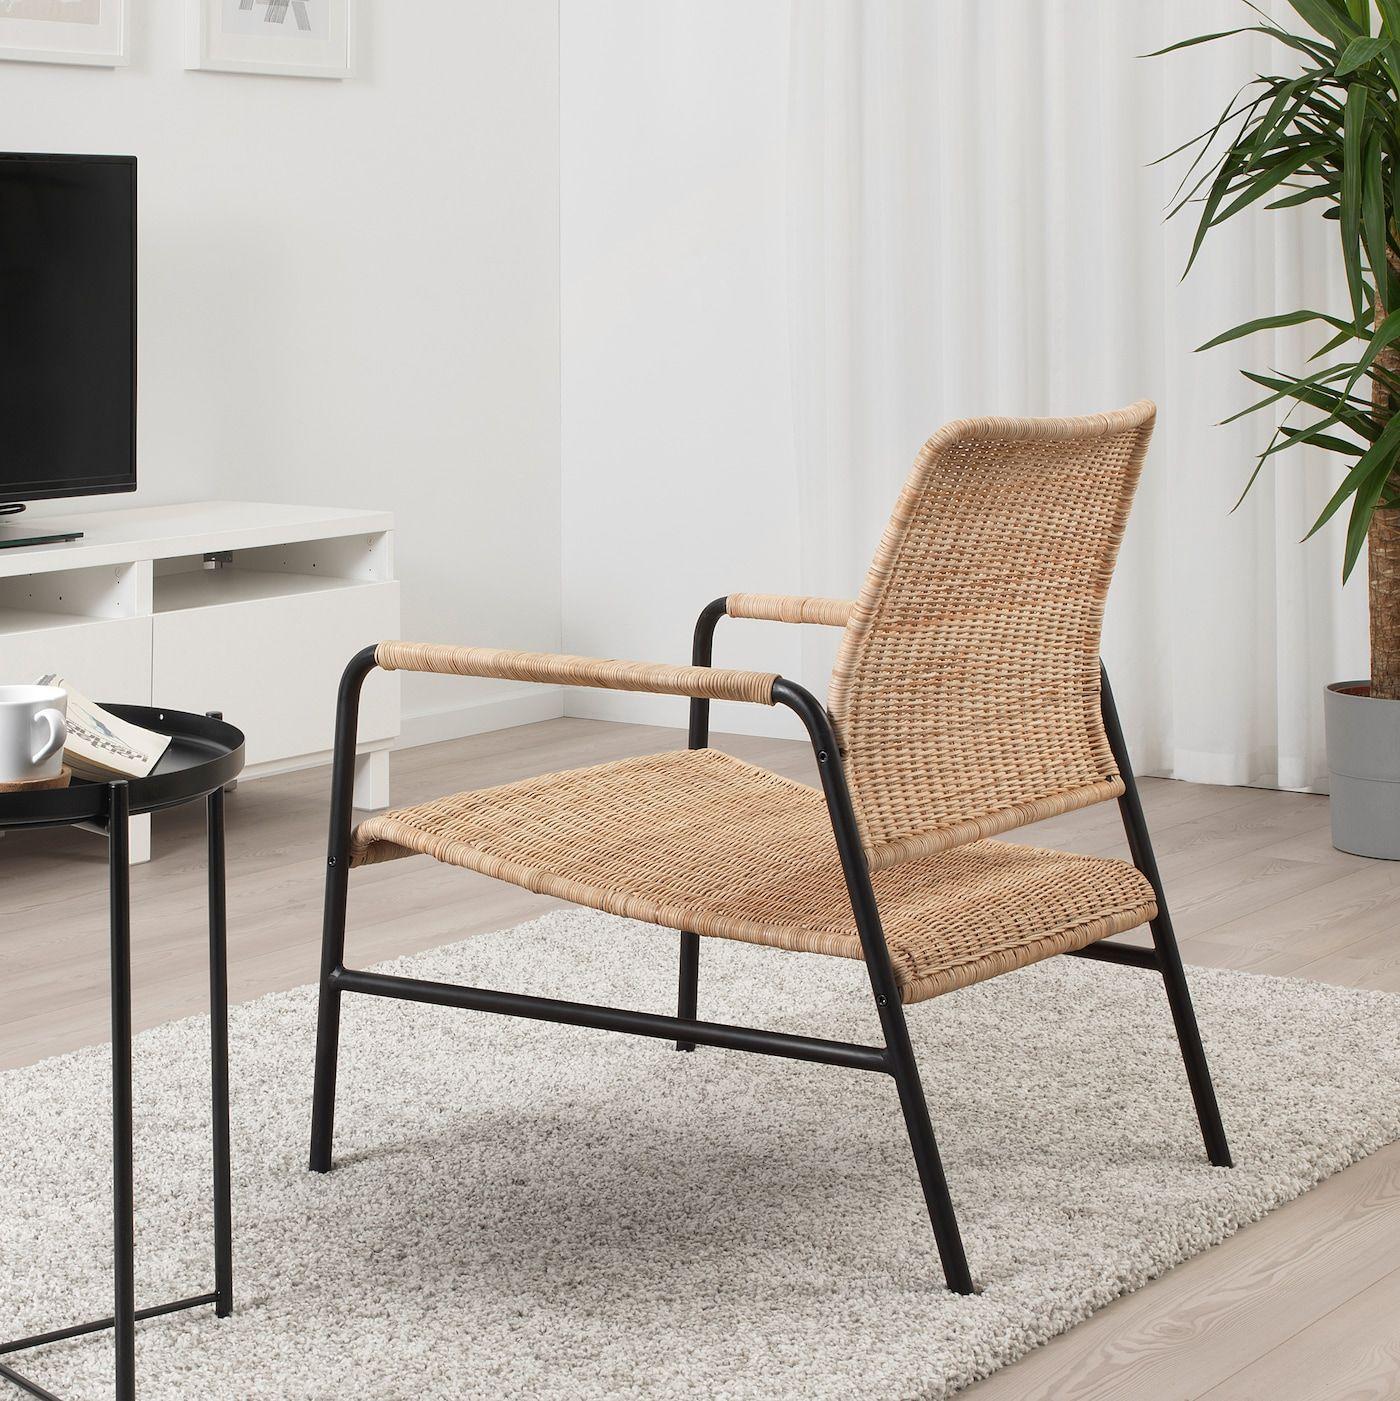 ULRIKSBERG Armchair rattan, anthracite IKEA in 2020